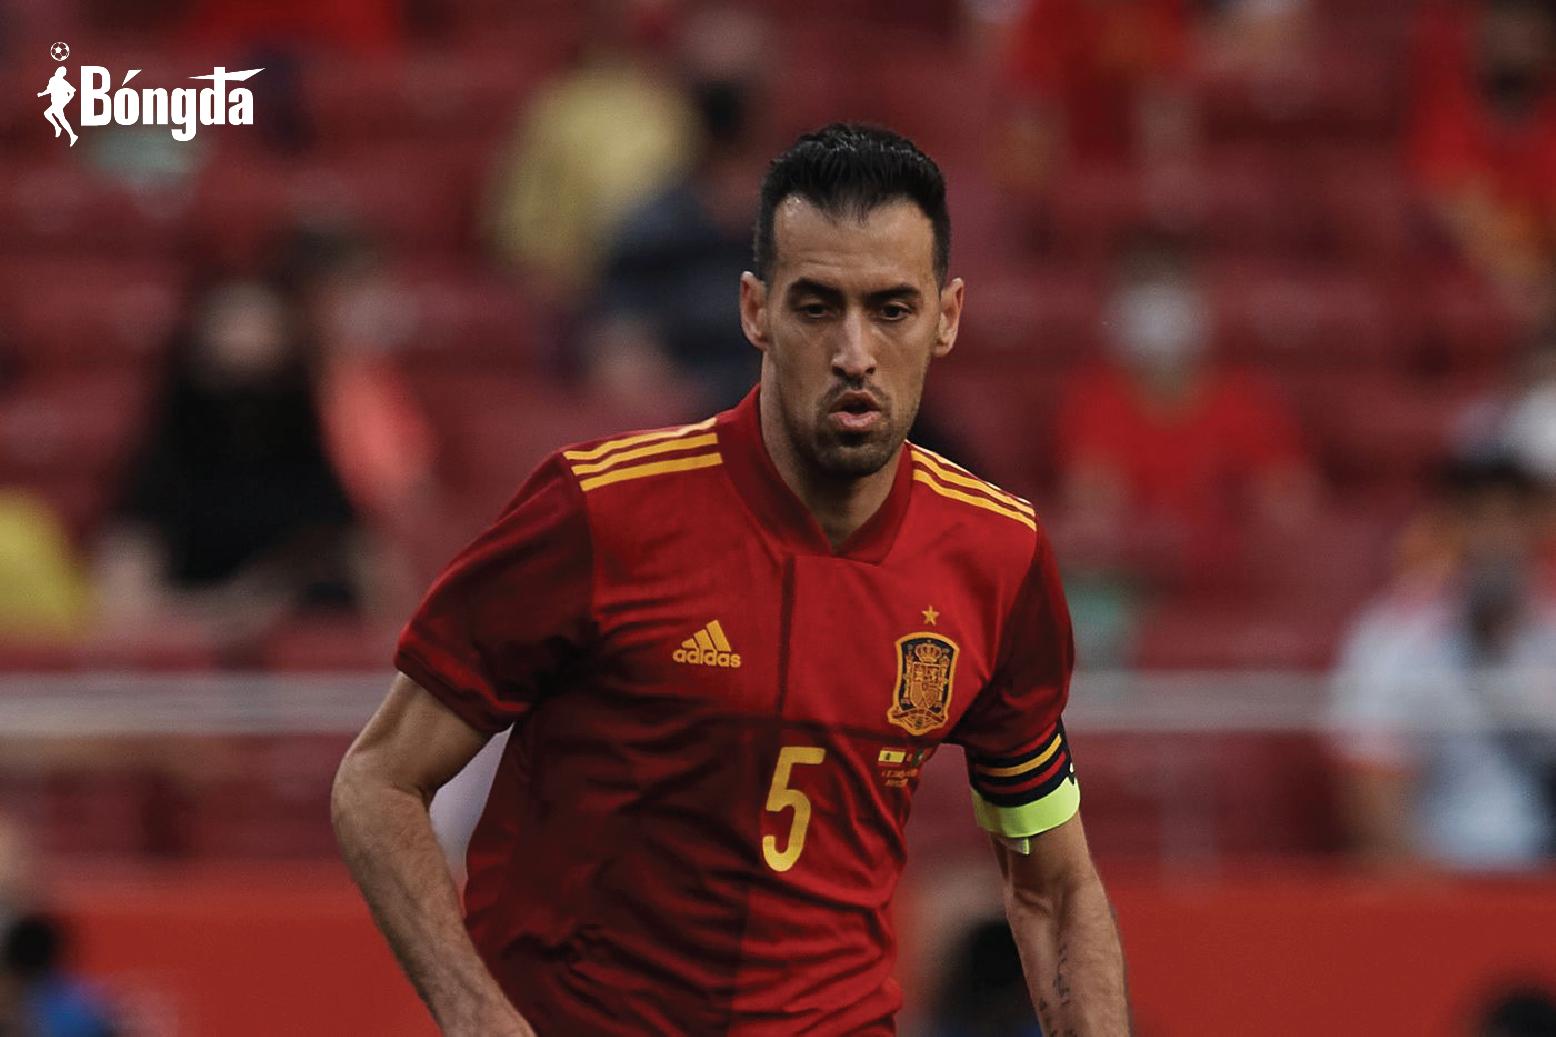 EURO 2020: Mắc Covid-19, Sergio Busquets khiến ĐT Tây Ban Nha lao đao